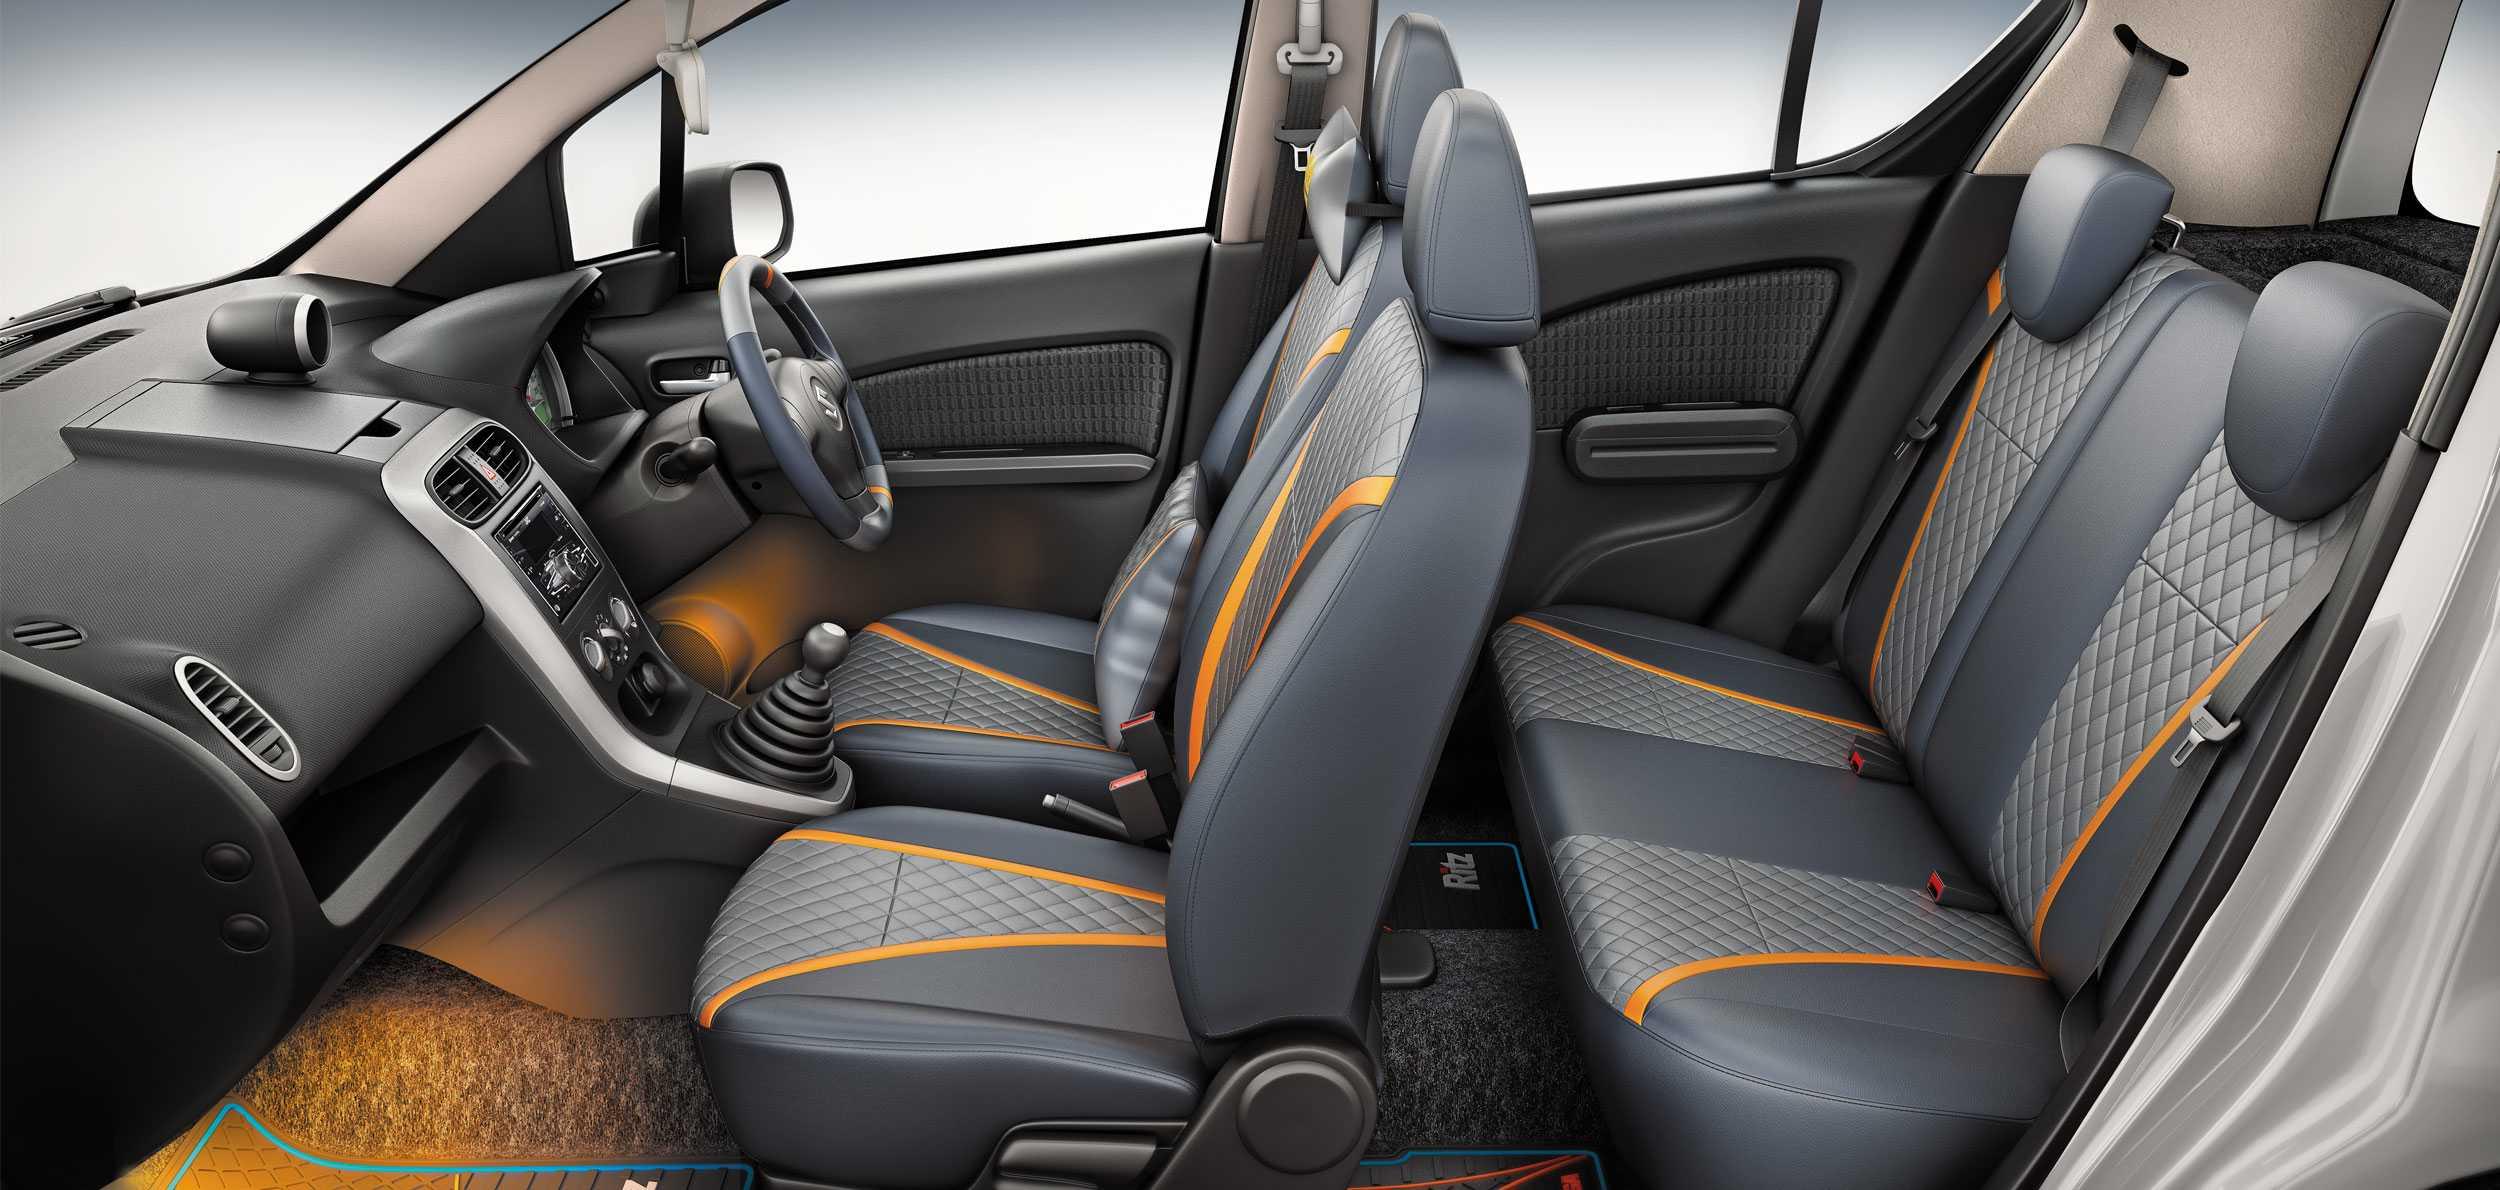 Maruti Suzuki Ritz Elate Special Edition Launched In India